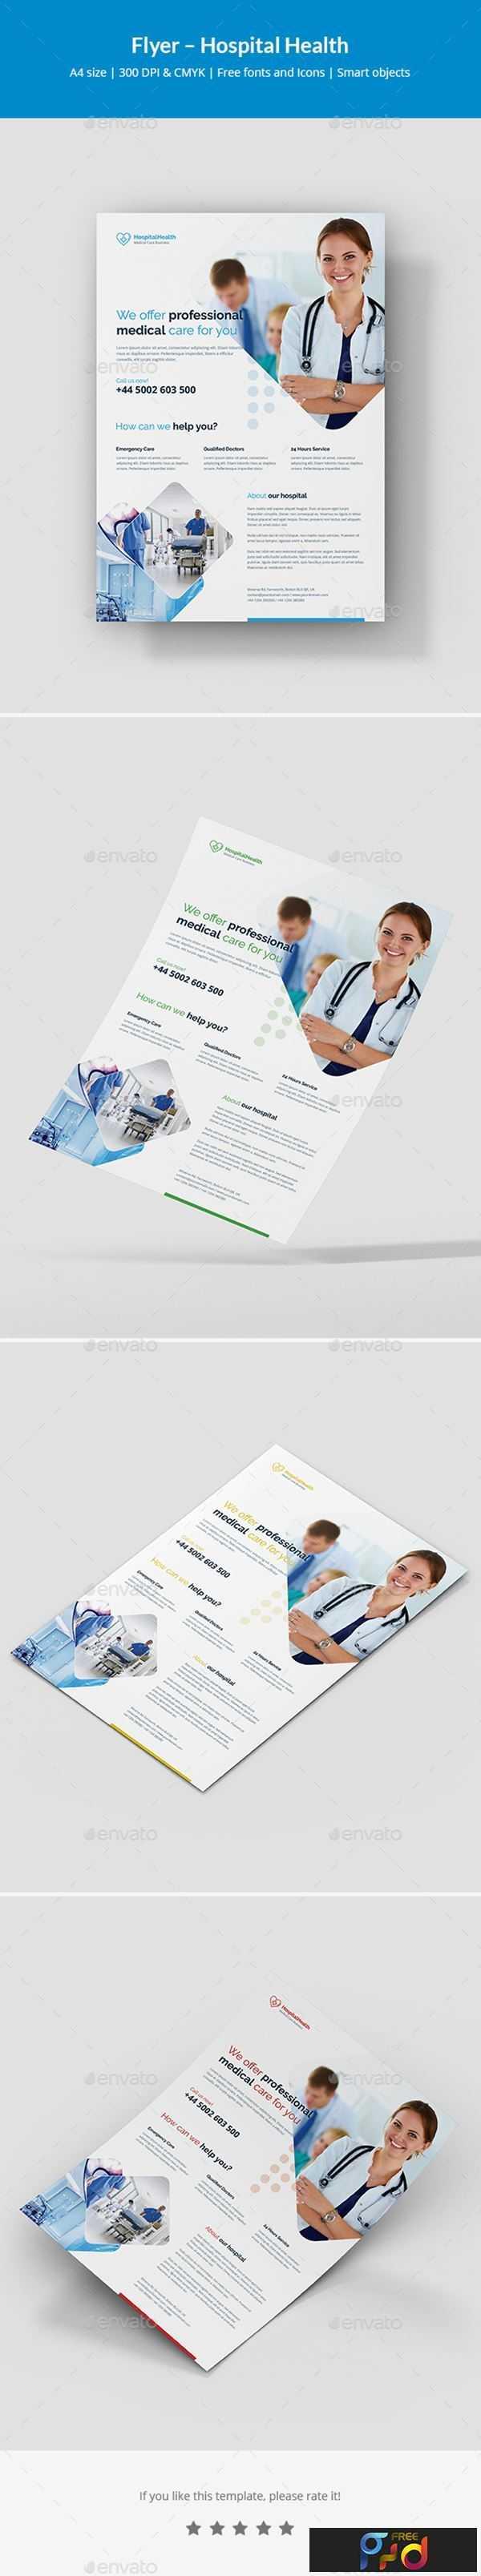 1807030 Flyer – Hospital Health 22062540 1